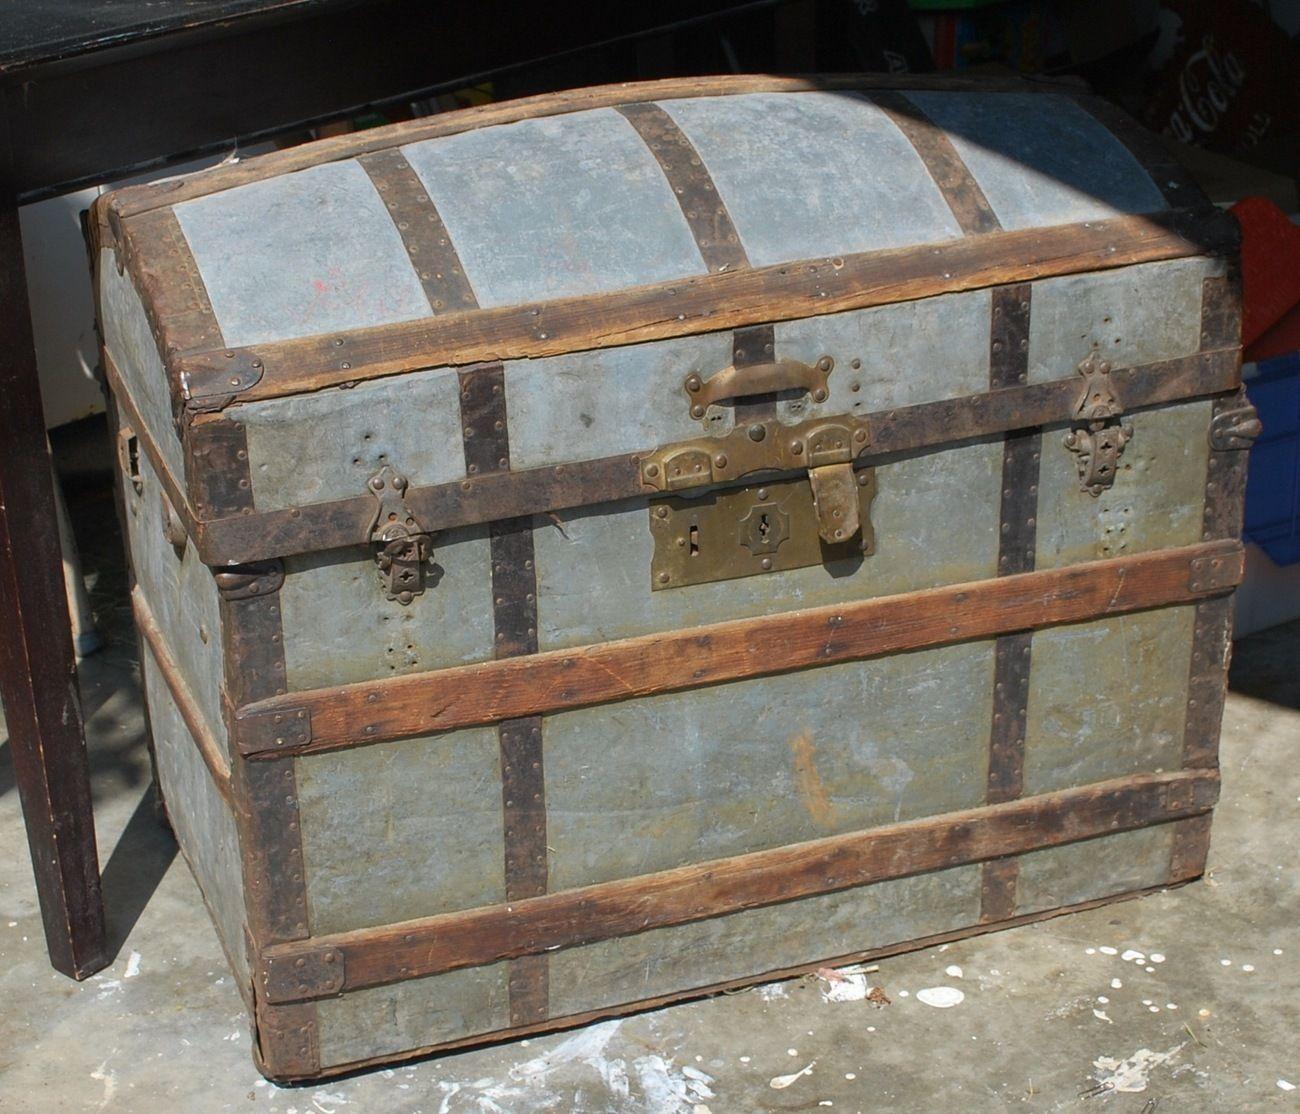 Antique zinc covered hump or camel back trunk | Antiques ...